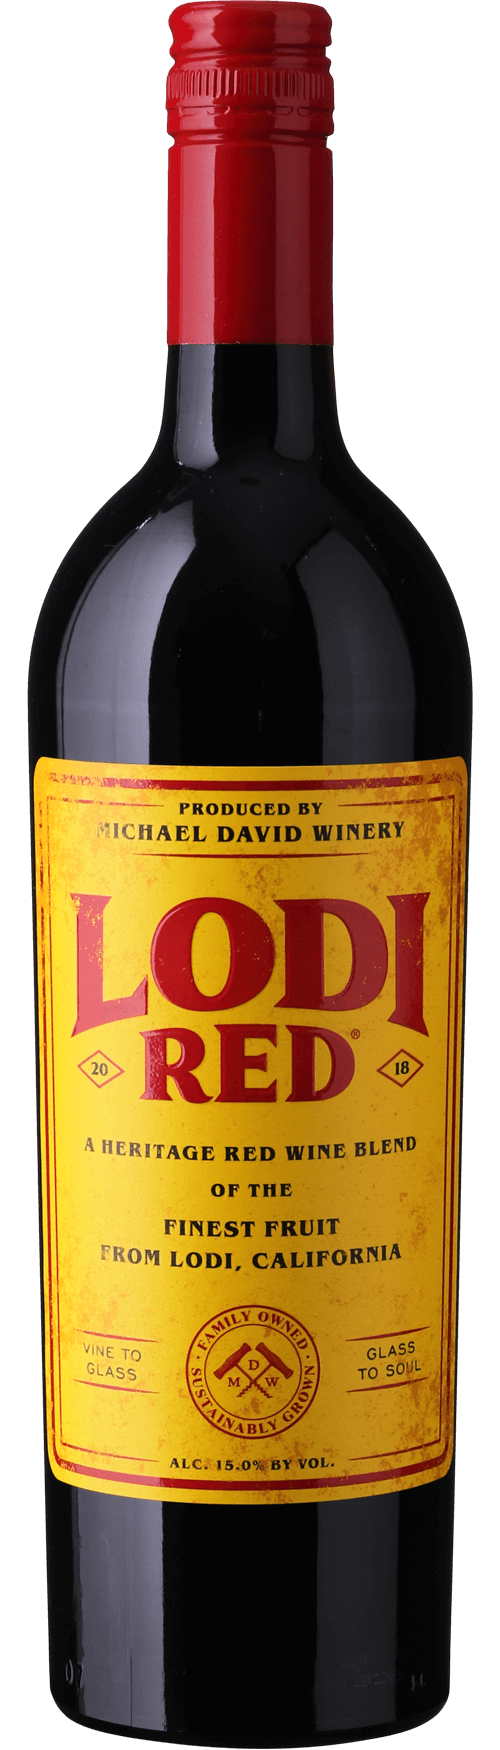 Michael David Winery Lodi Red 2018 75 cl